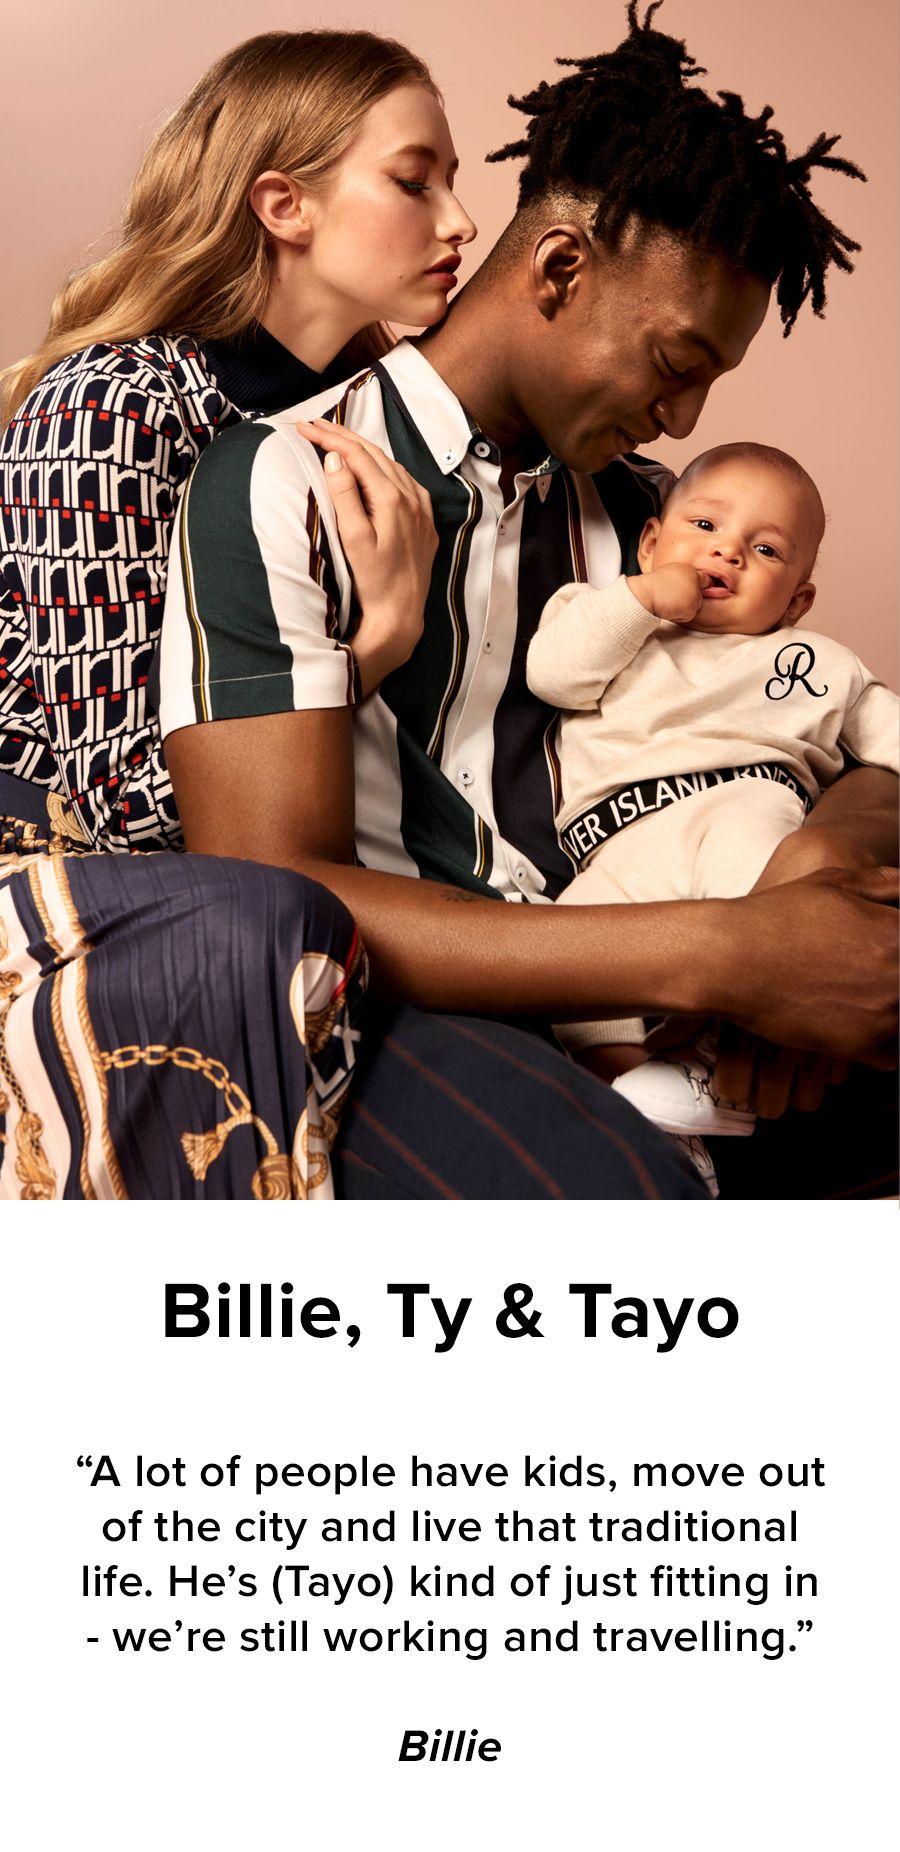 Billie, Ty & Tayo